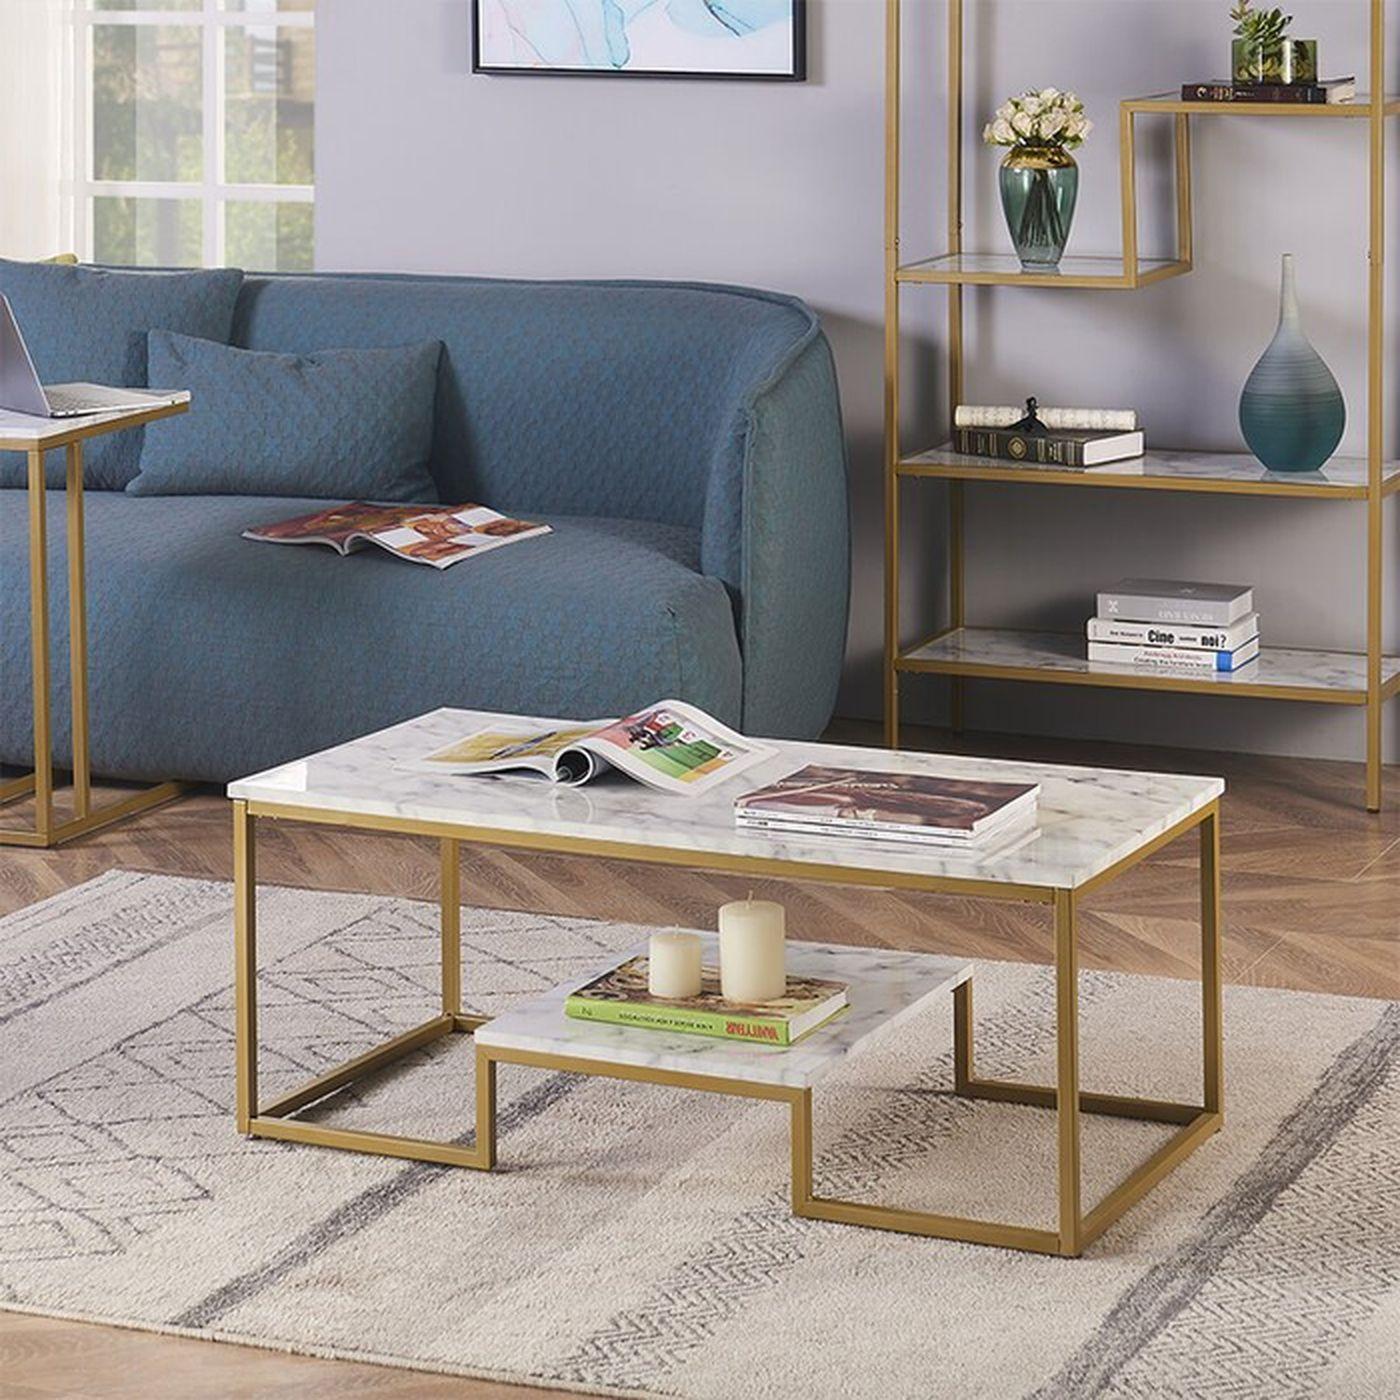 Deleo Coffee Table Wayfair Coffee Table Furniture Coffee Table Wayfair [ 1400 x 1400 Pixel ]